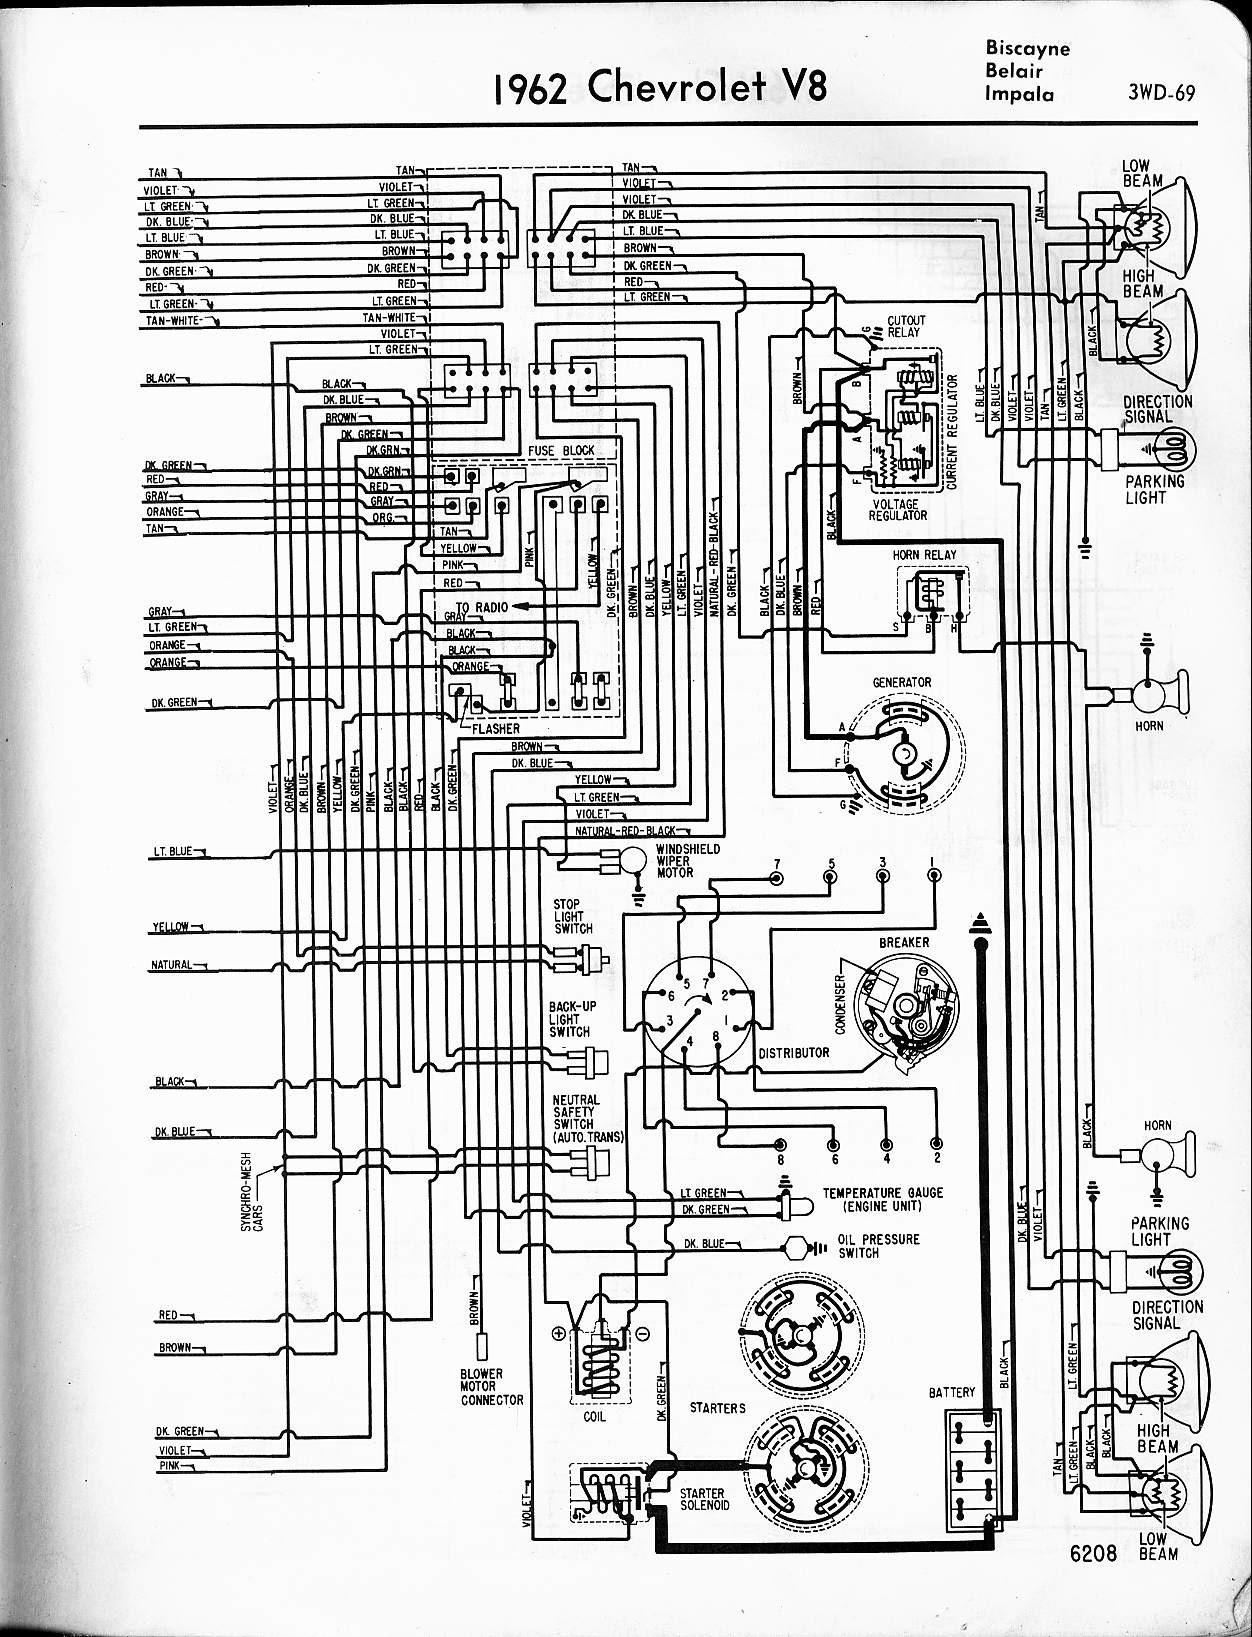 2003 Chevy Impala Engine Diagram